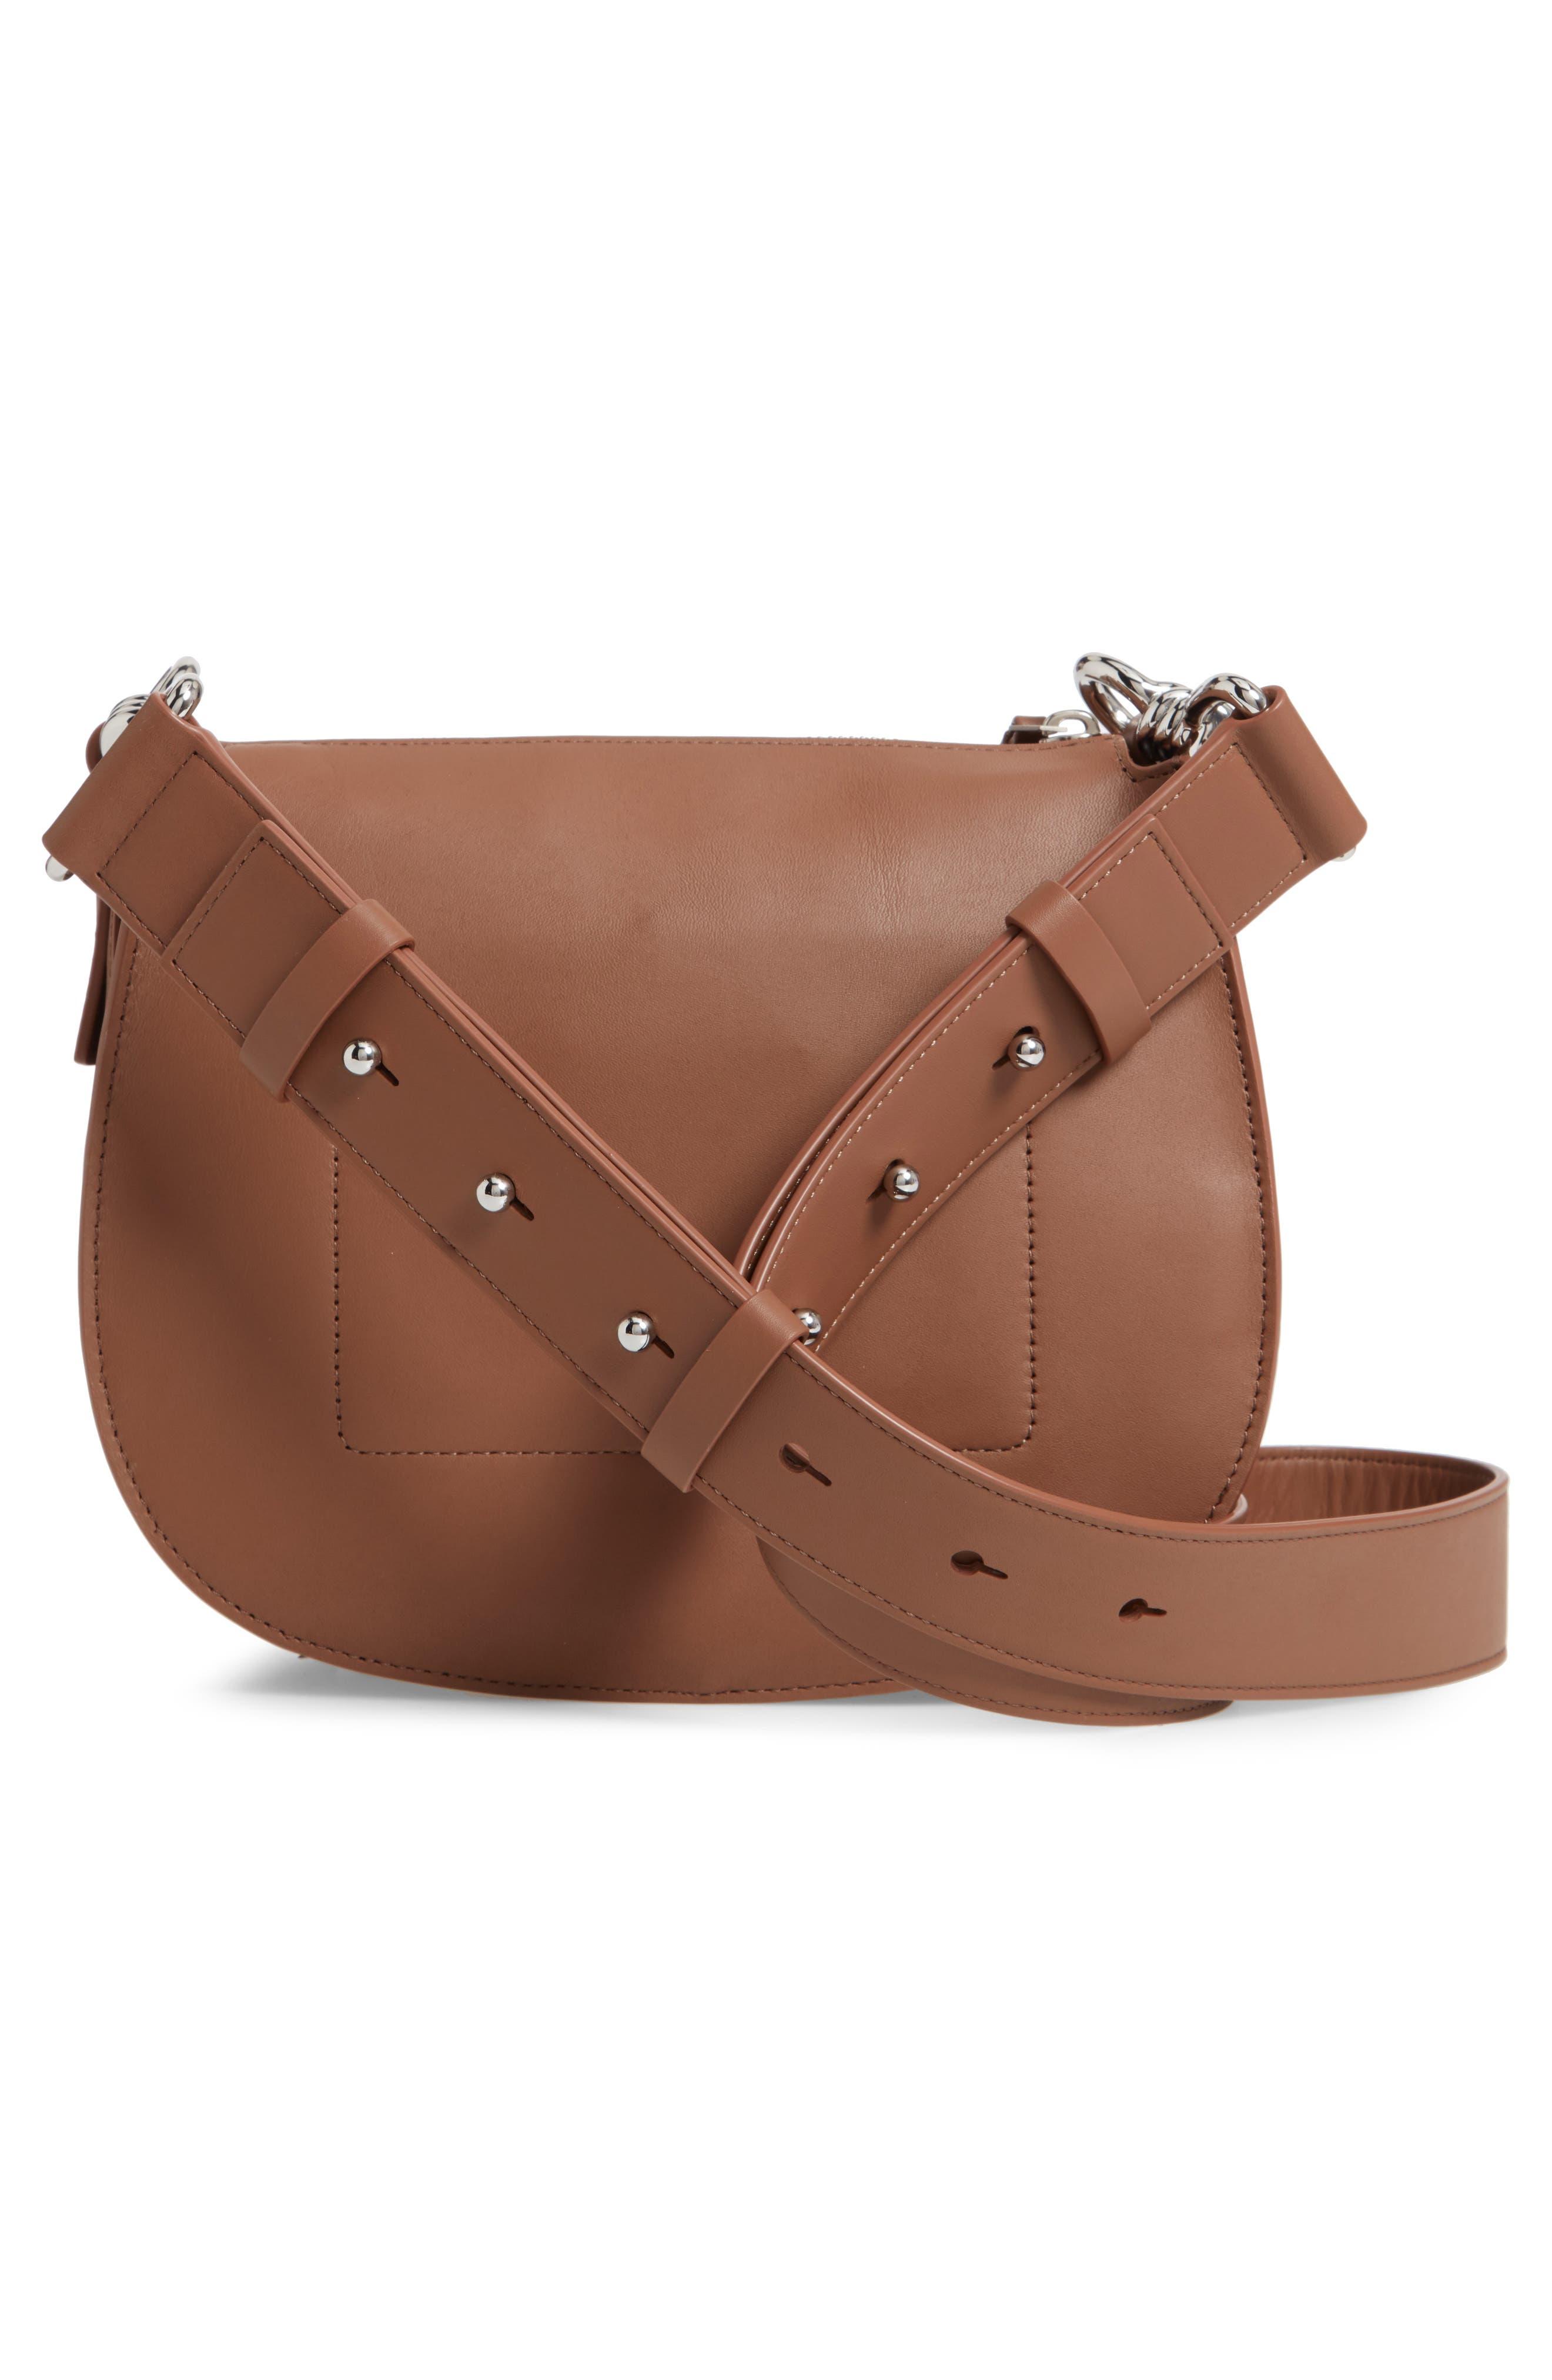 ALLSAINTS, Captain Round Leather Crossbody Bag, Alternate thumbnail 3, color, MILK CHOCOLATE